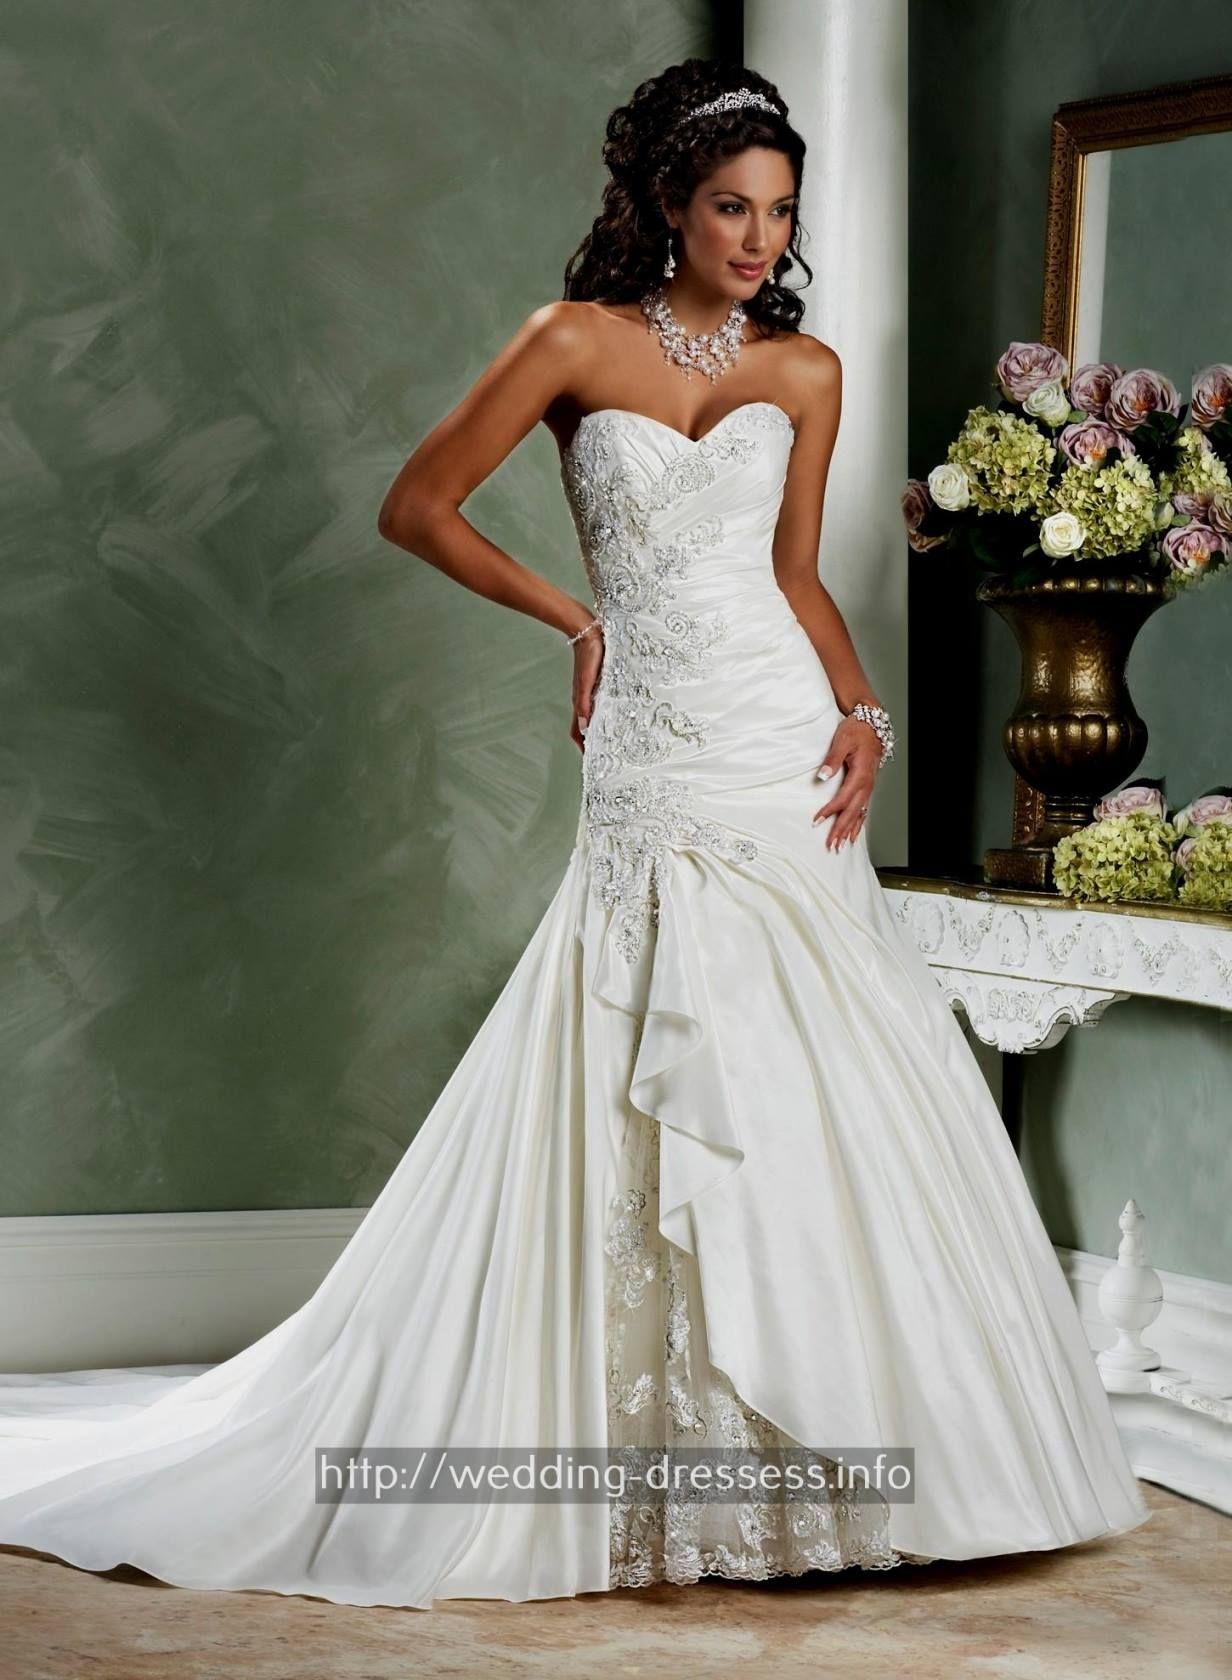 Redneck wedding dress  Wedding Dresses Beach Halter  Western bridesmaid dresses Fall